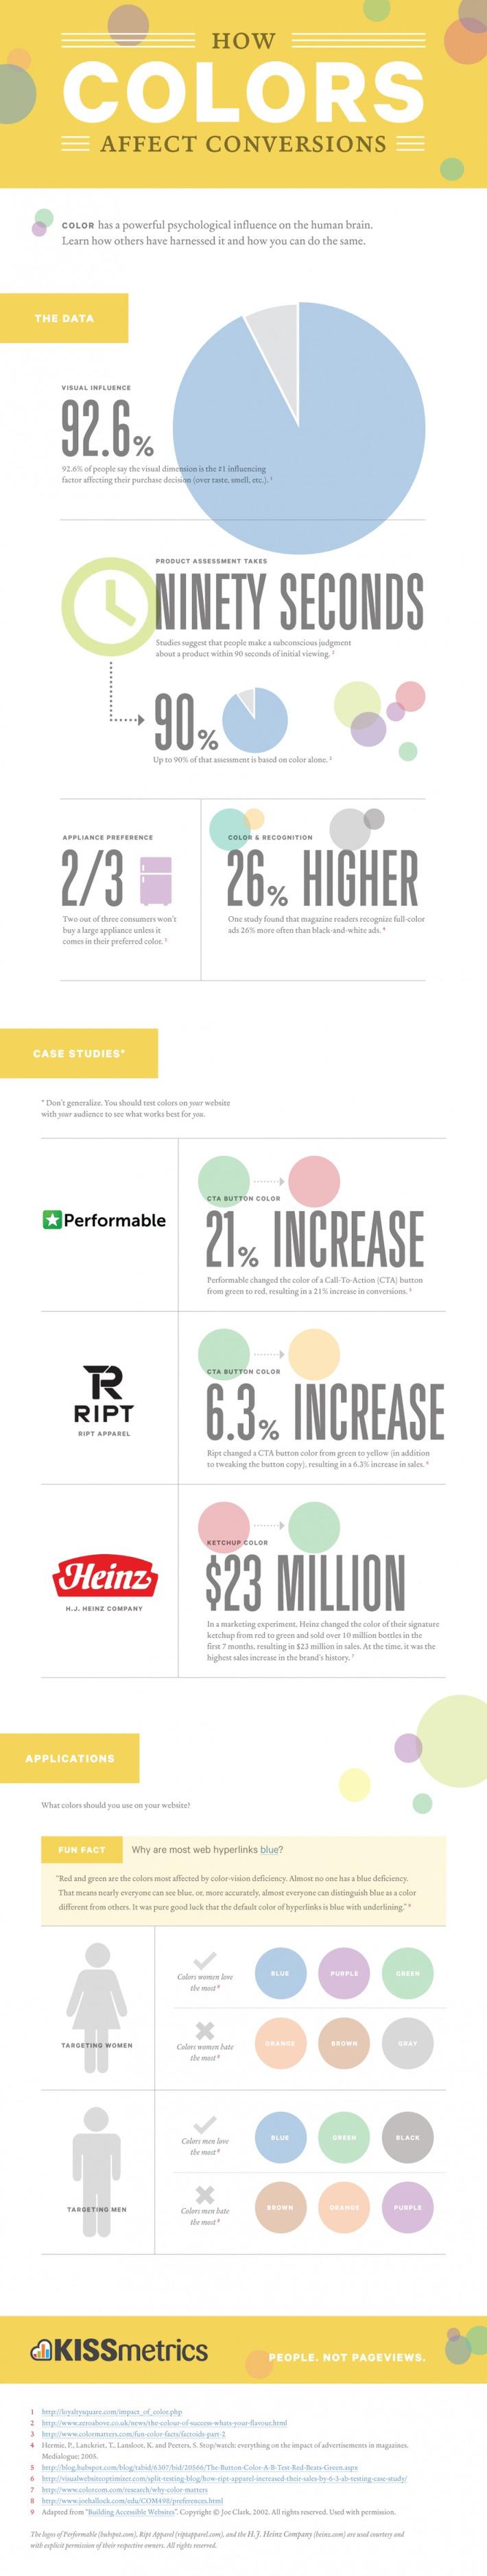 How Colors Affect Conversions [Infographic]   SEO et Social Media Marketing   Scoop.it